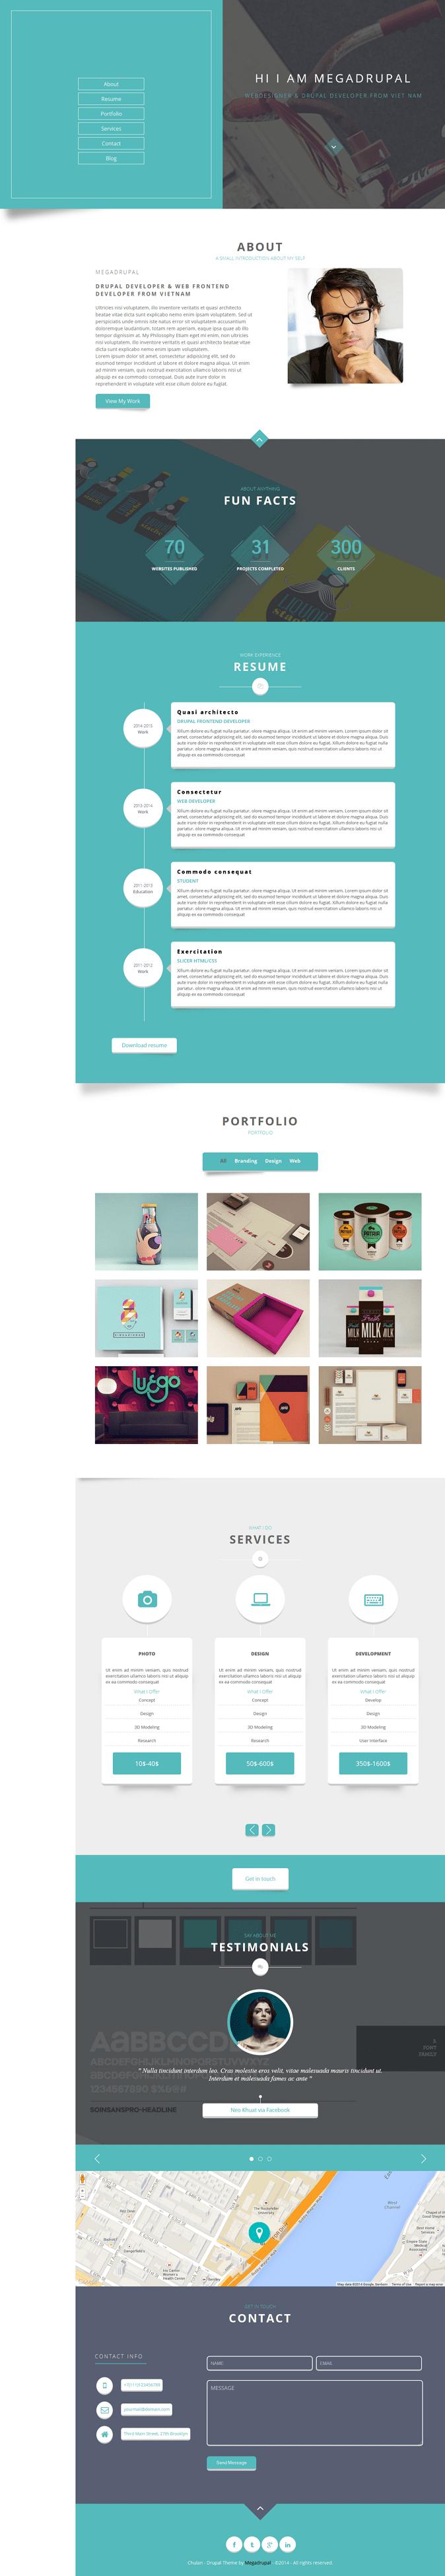 Chulan is a fully Responsive, Flat, Minimalist, Professional & Multipurpose v Card theme bui ...